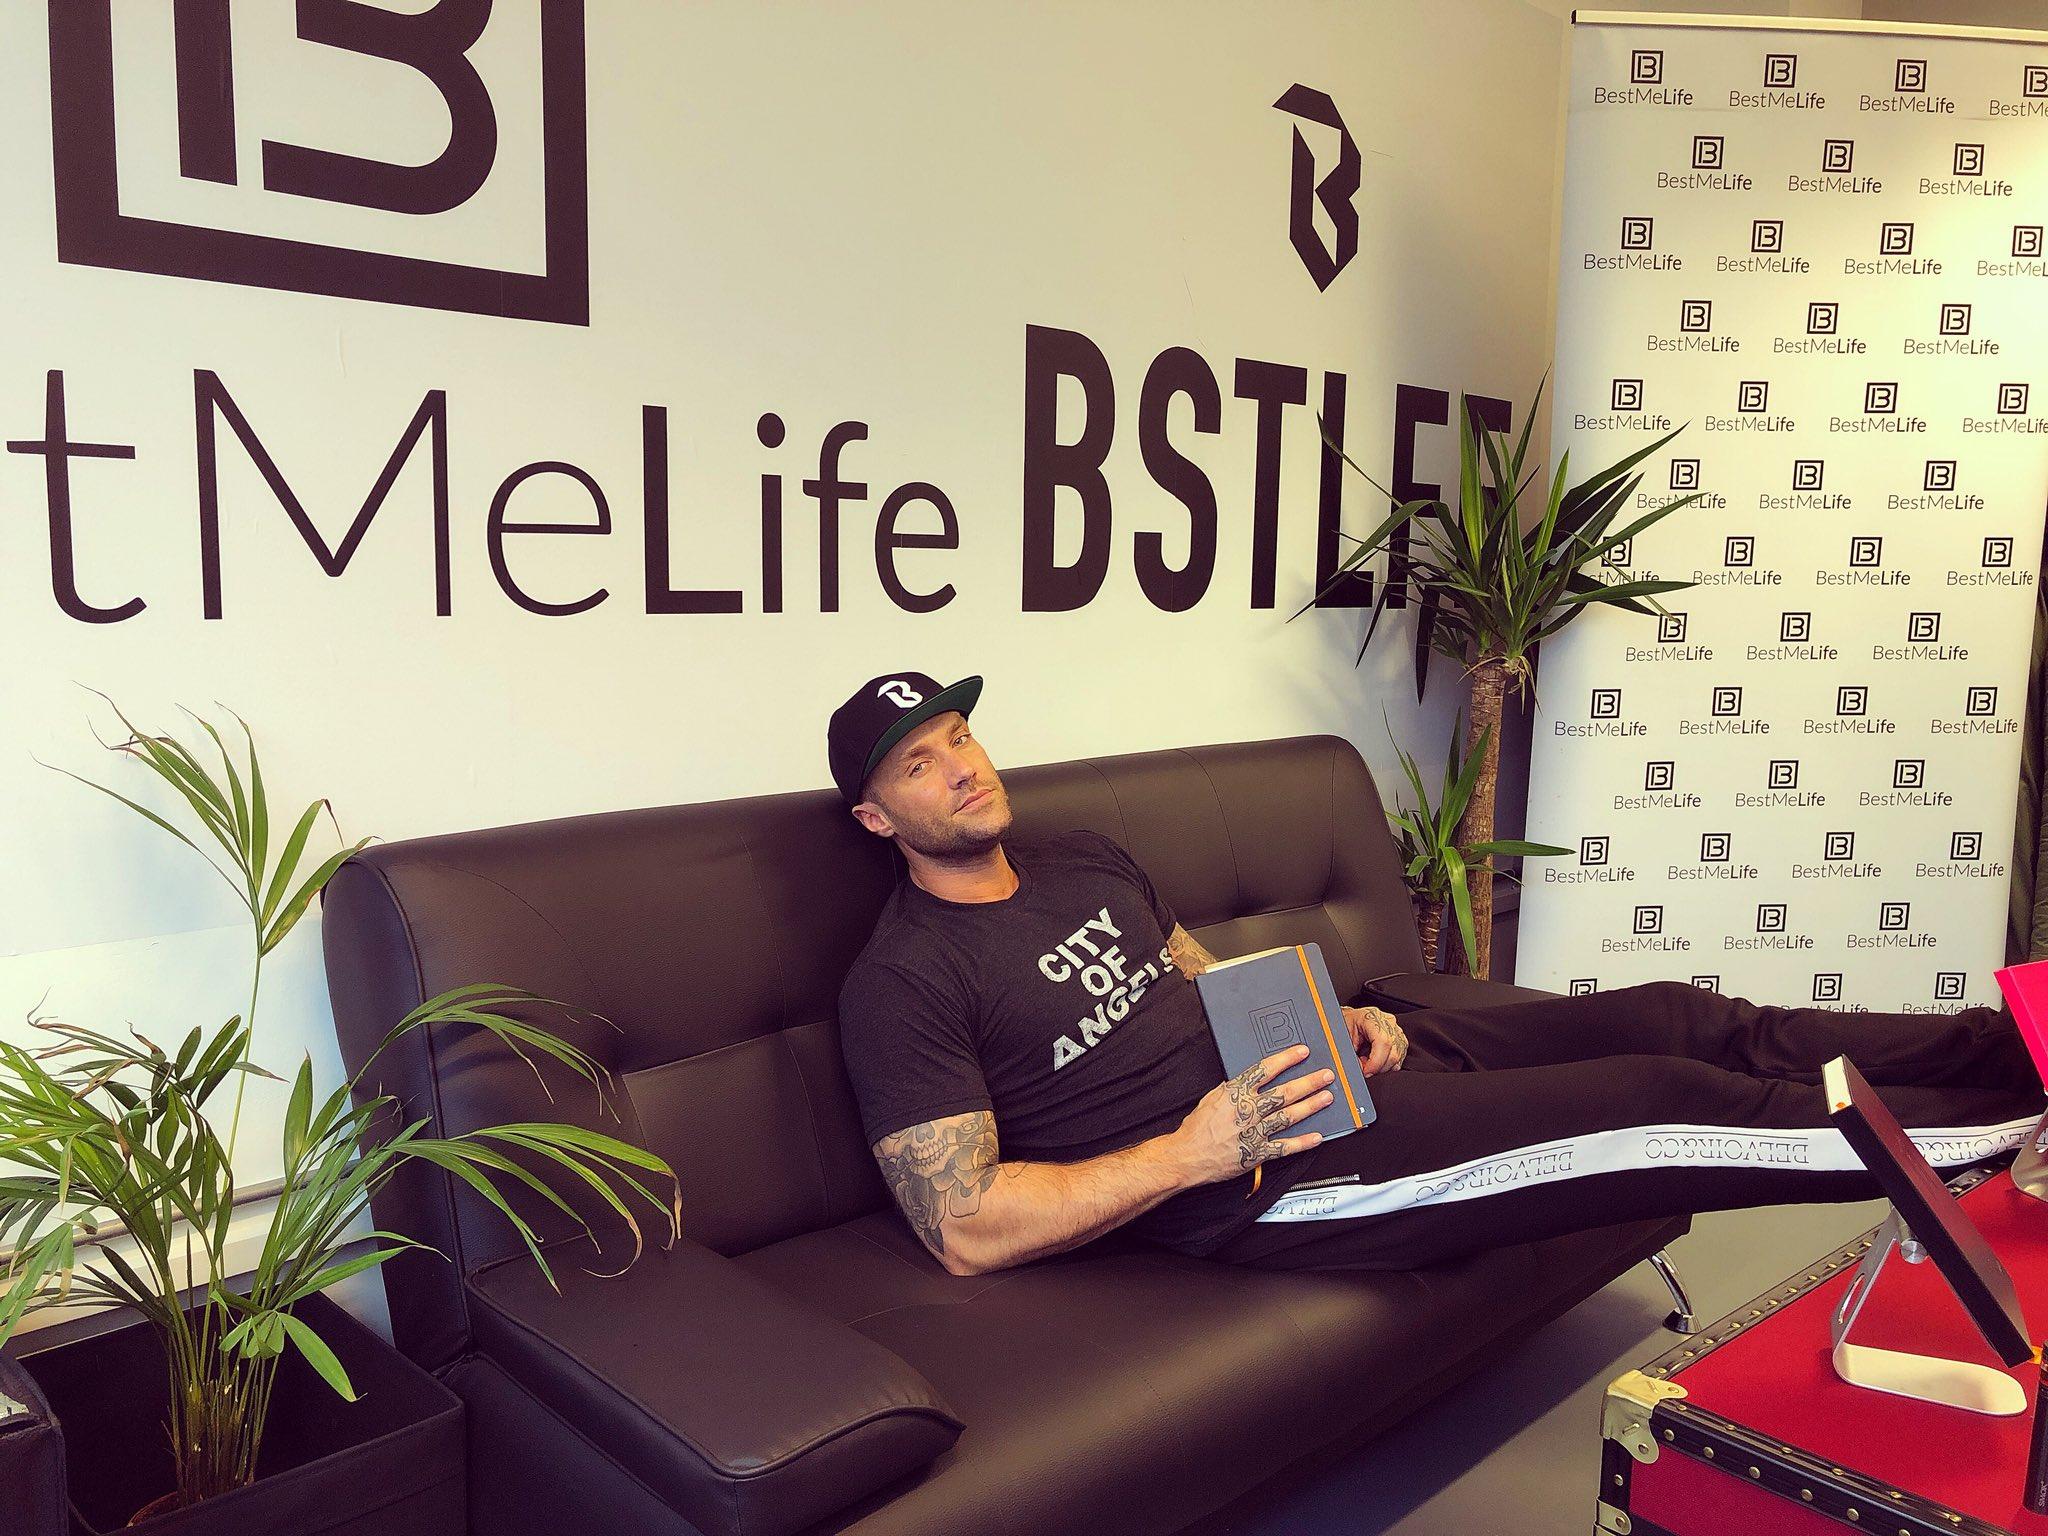 Brand building @thebestmelife https://t.co/djPaQ1GSLU